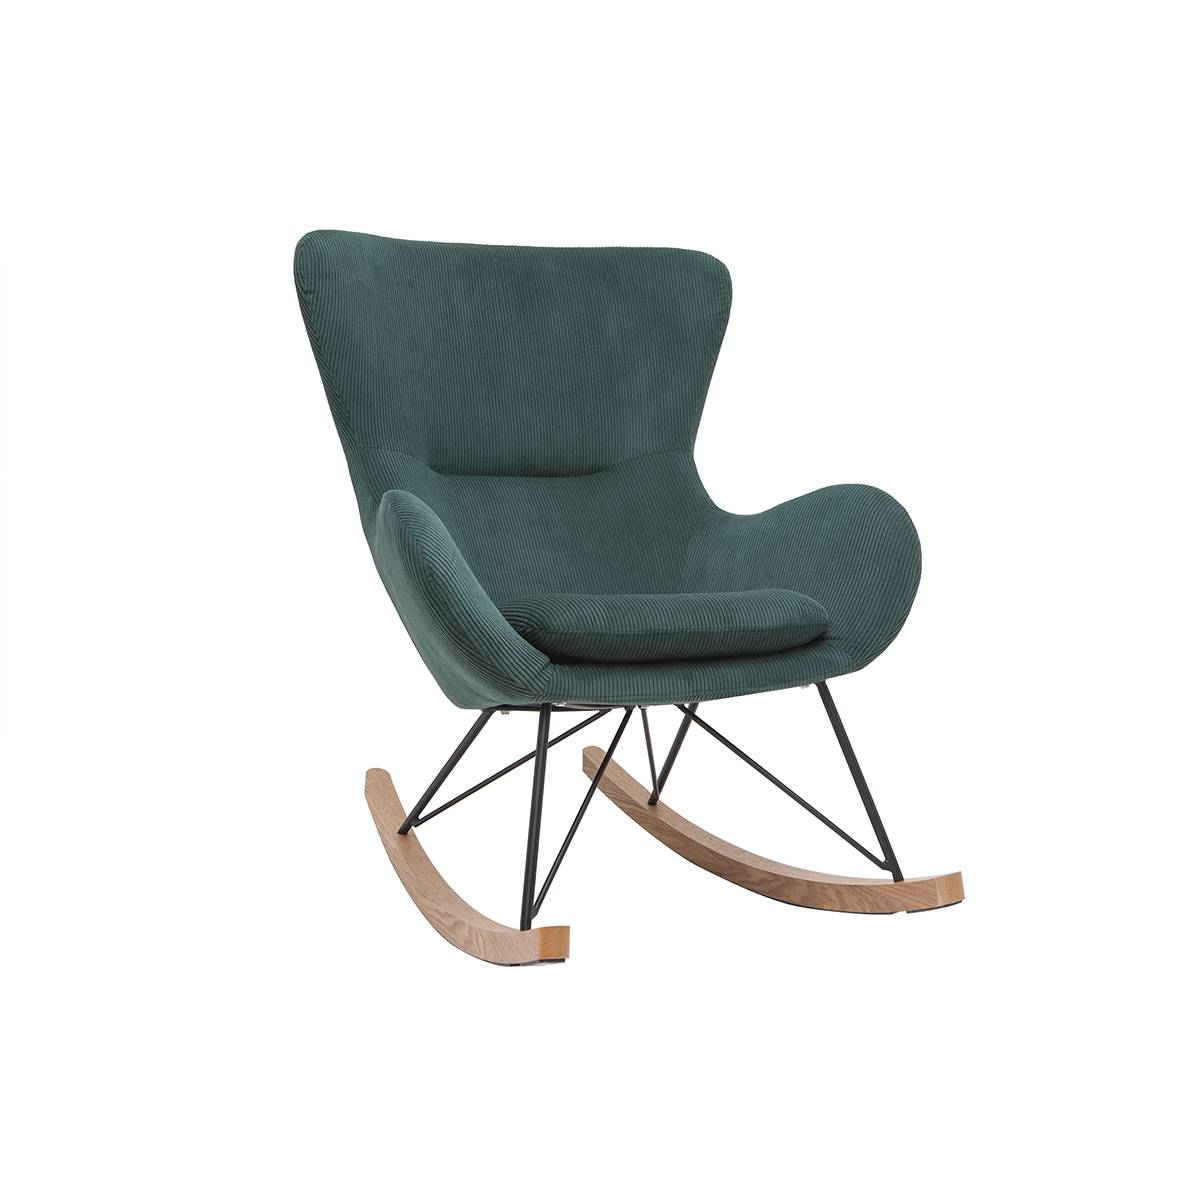 Miliboo Rocking chair design velours côtelé vert ESKUA